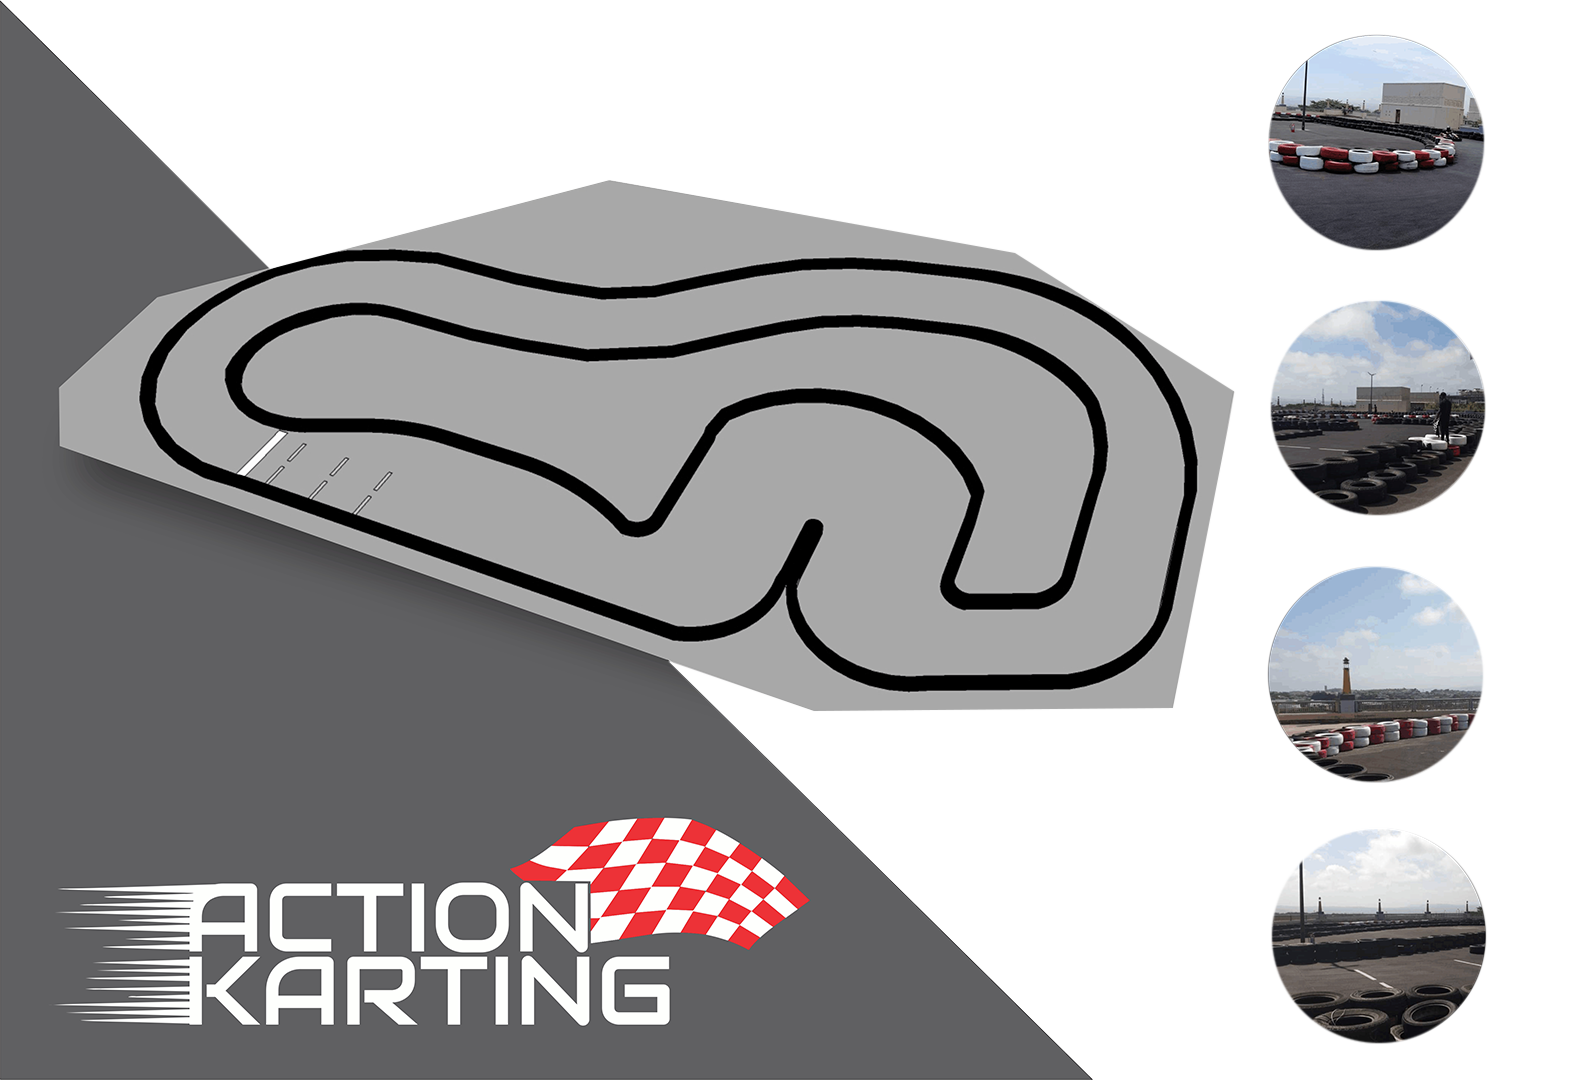 Action Karting 1